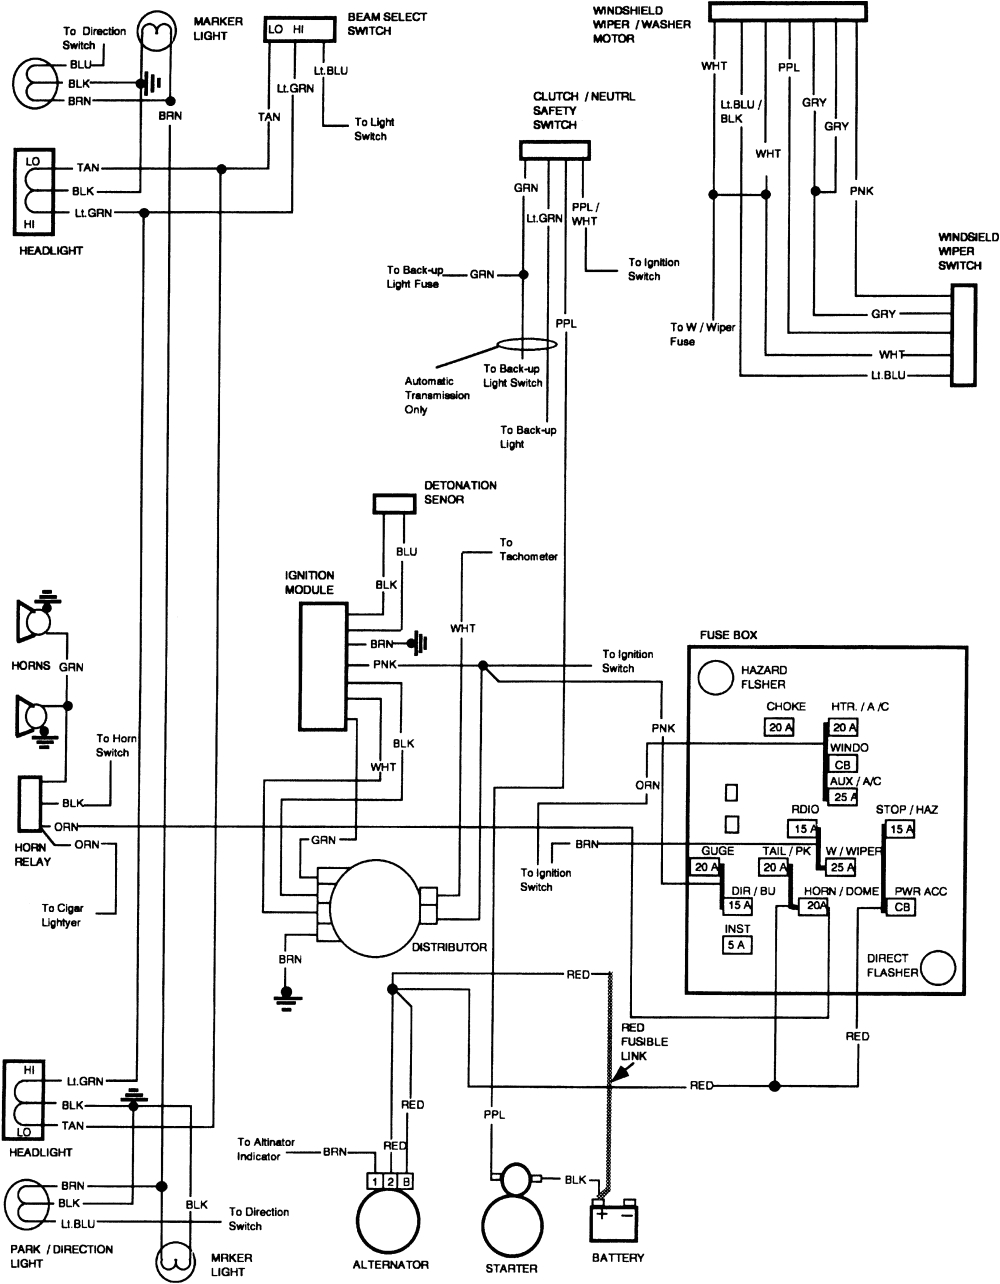 1981 Chevy Truck Wiring Diagram 81 Chevy Pickup Wiring Diagram Wiring Diagram Expert